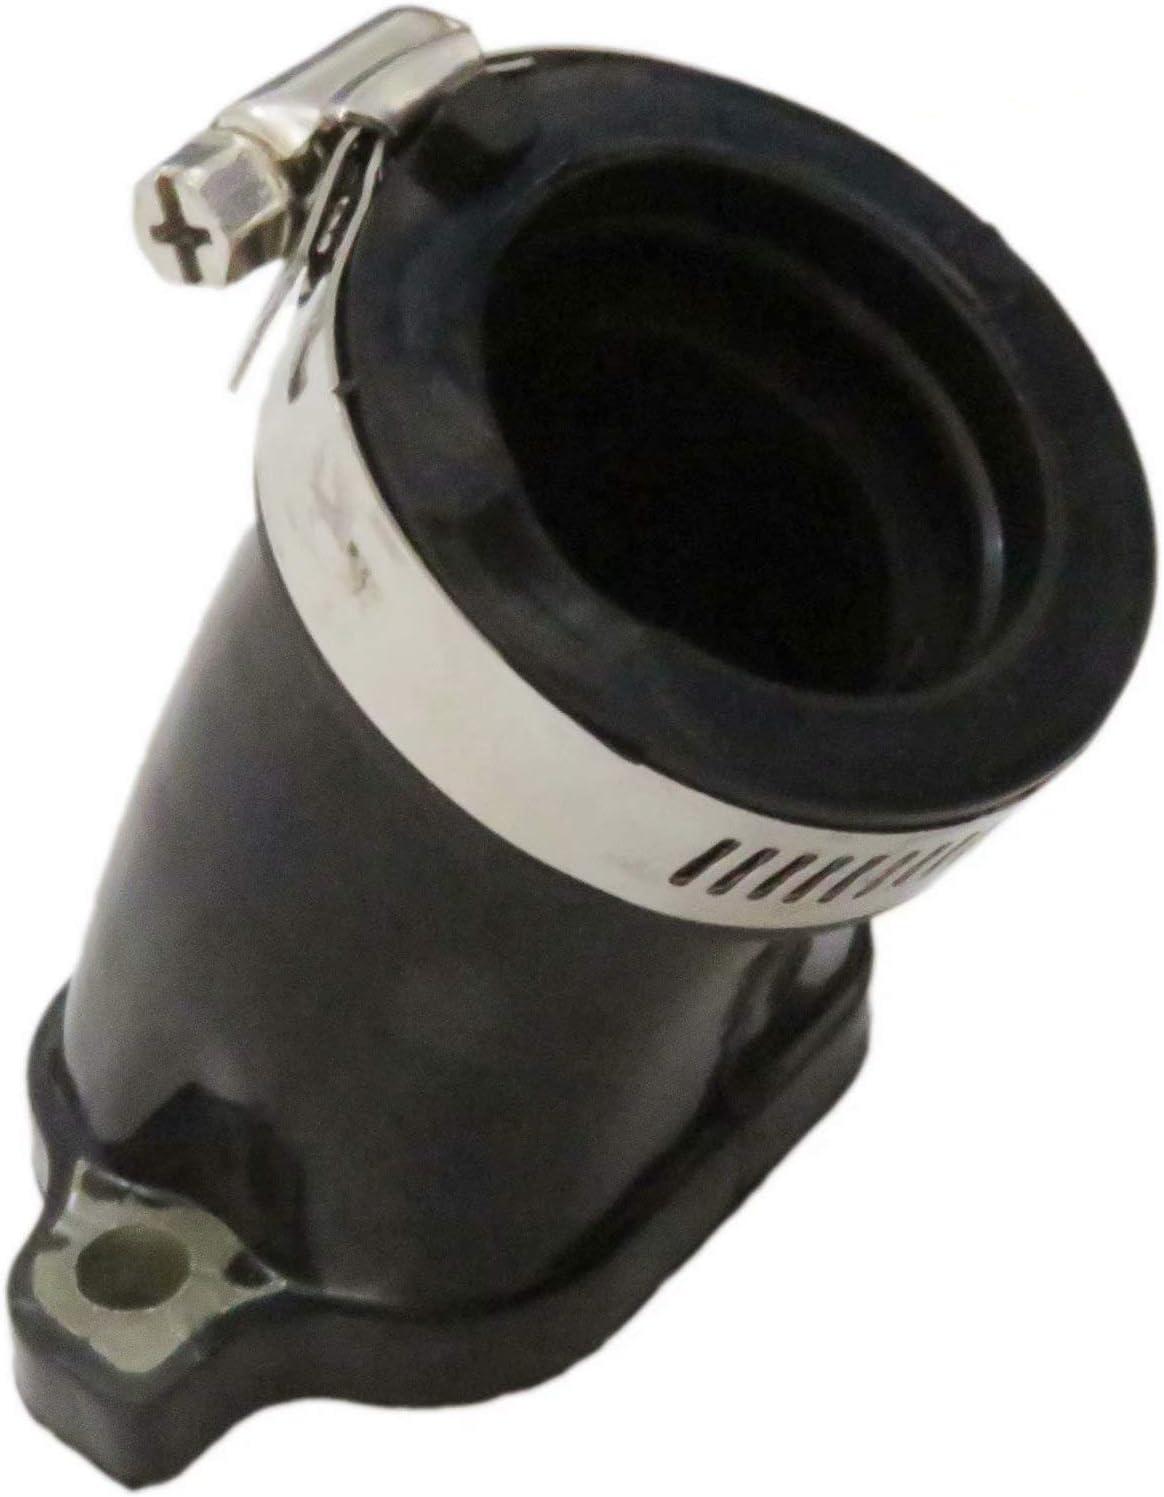 1253415 New Carburetor Intake Manifold Carb Boot For Polaris Sportsman 600 700 2002-06